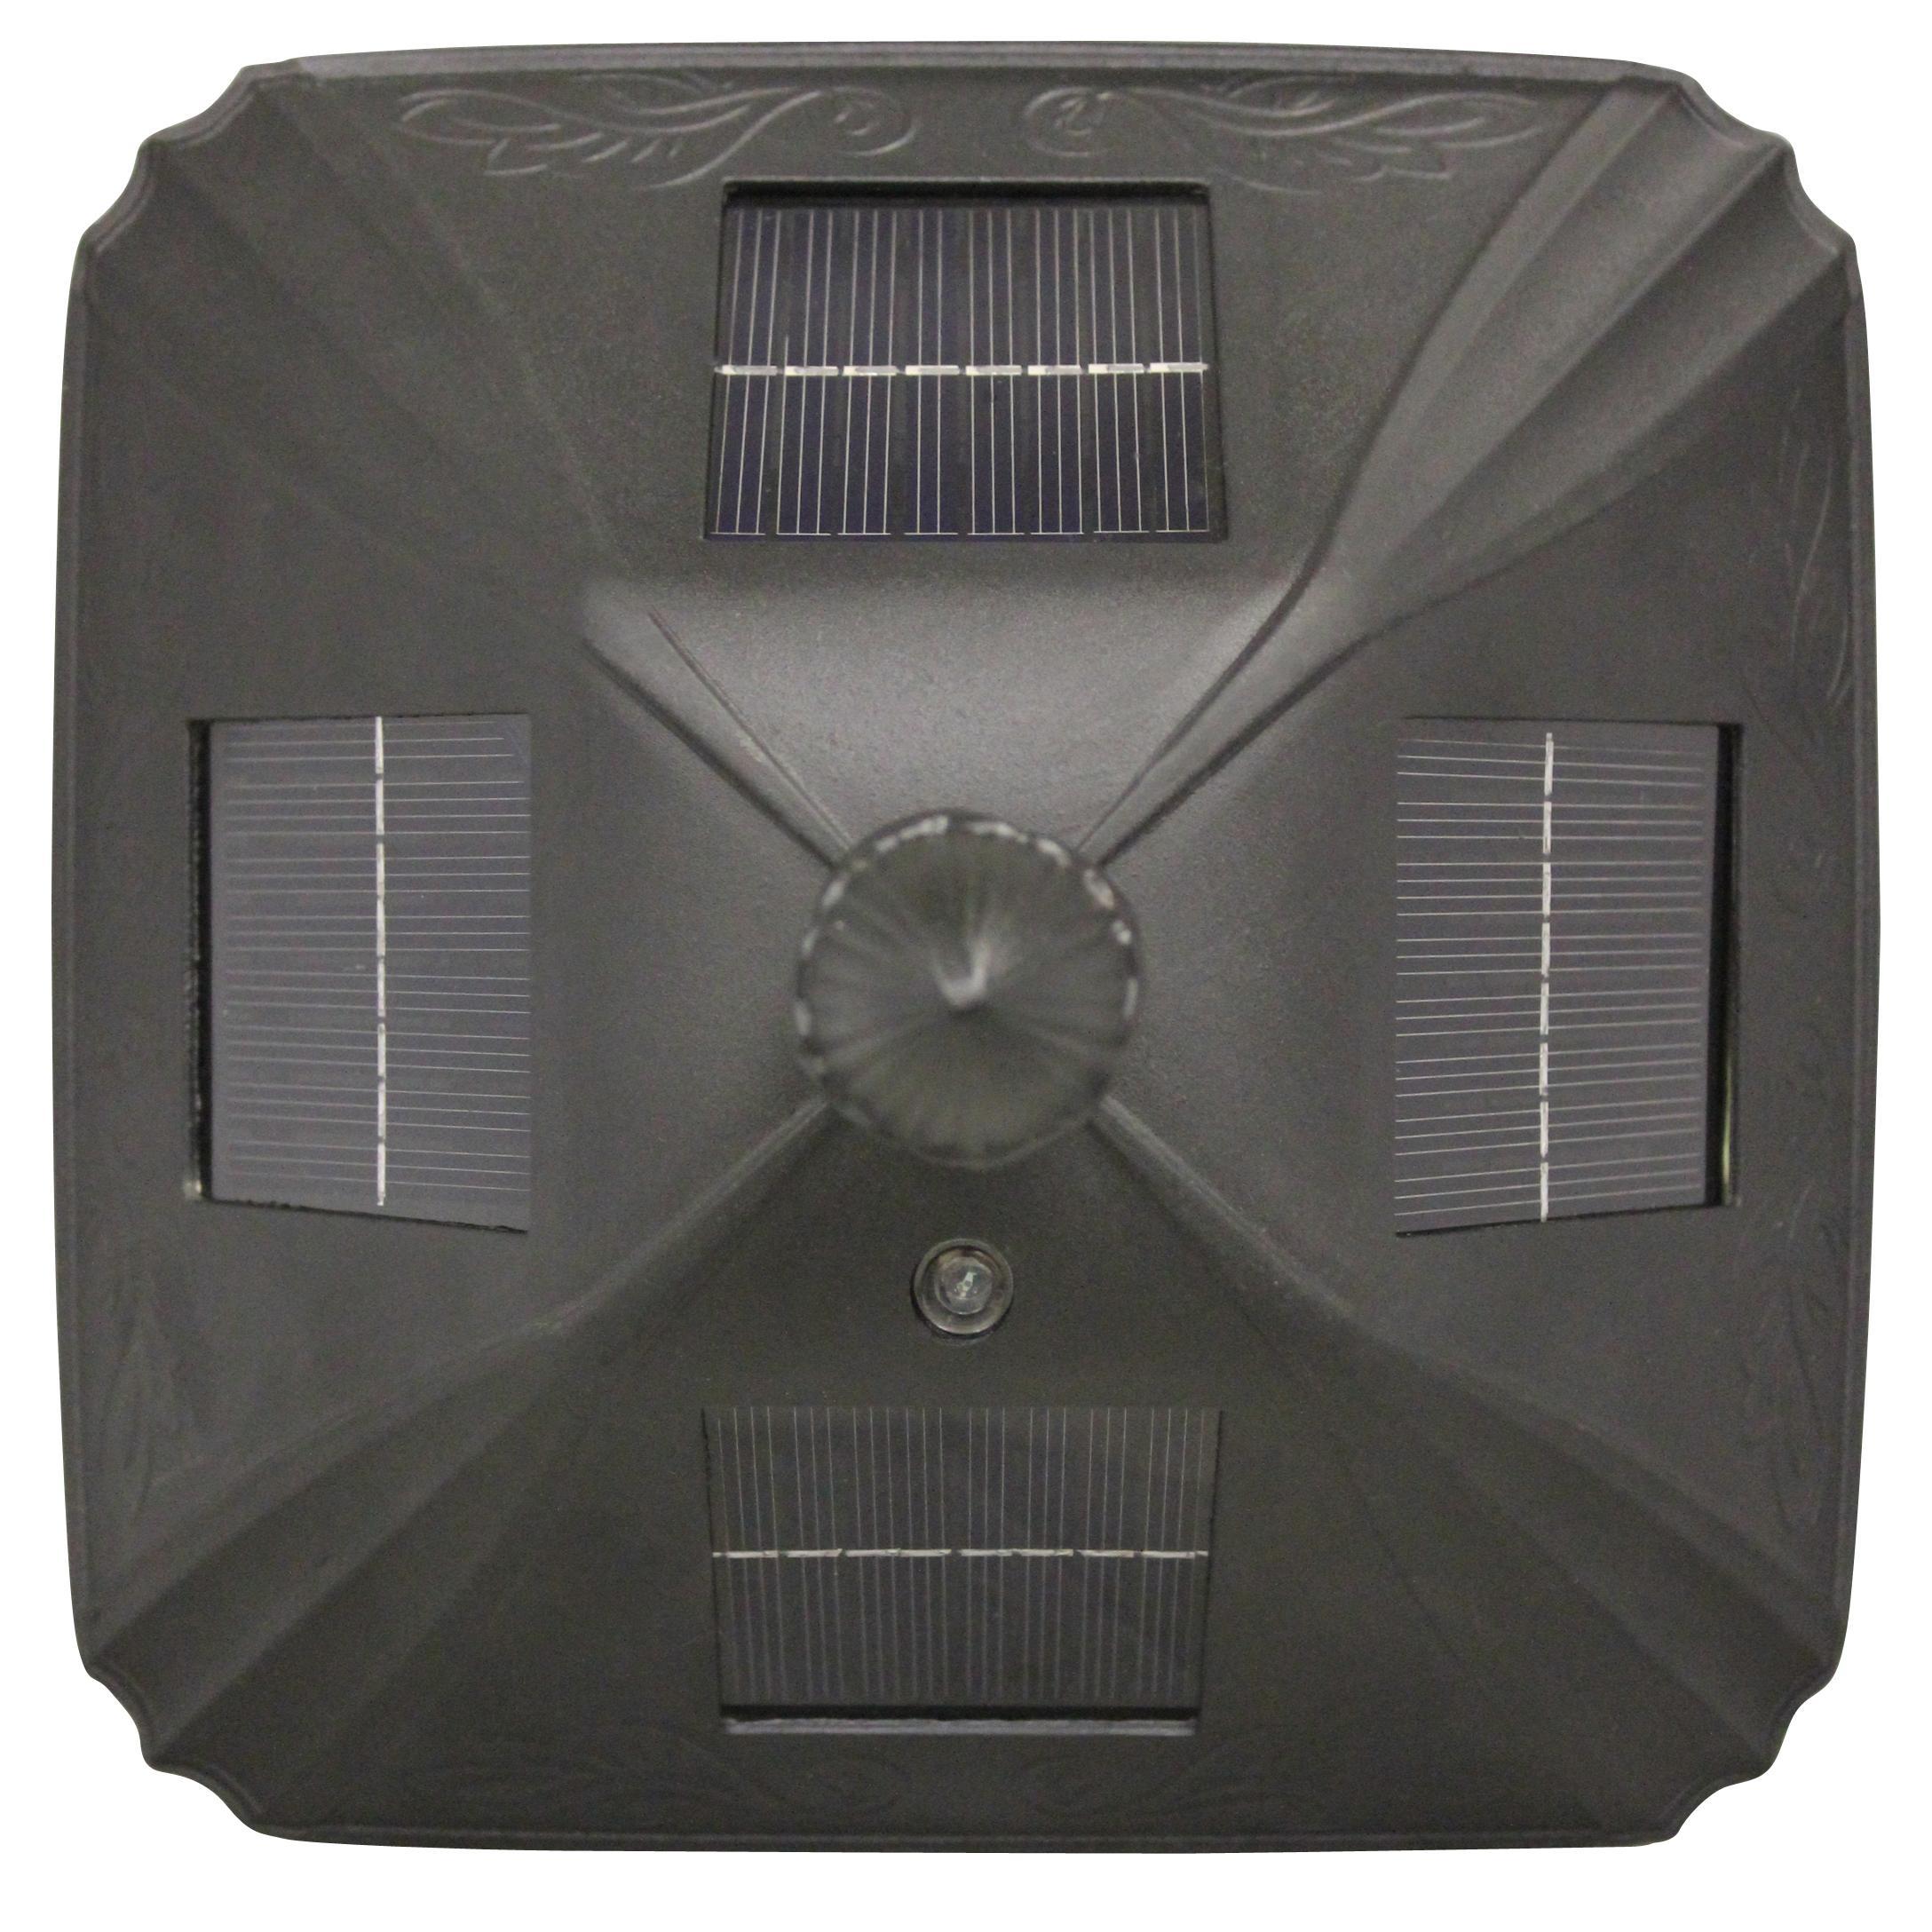 Amazon Com Gama Sonic Windsor Solar Outdoor Post Light: Amazon.com : Gama Sonic Baytown Solar Outdoor LED Light